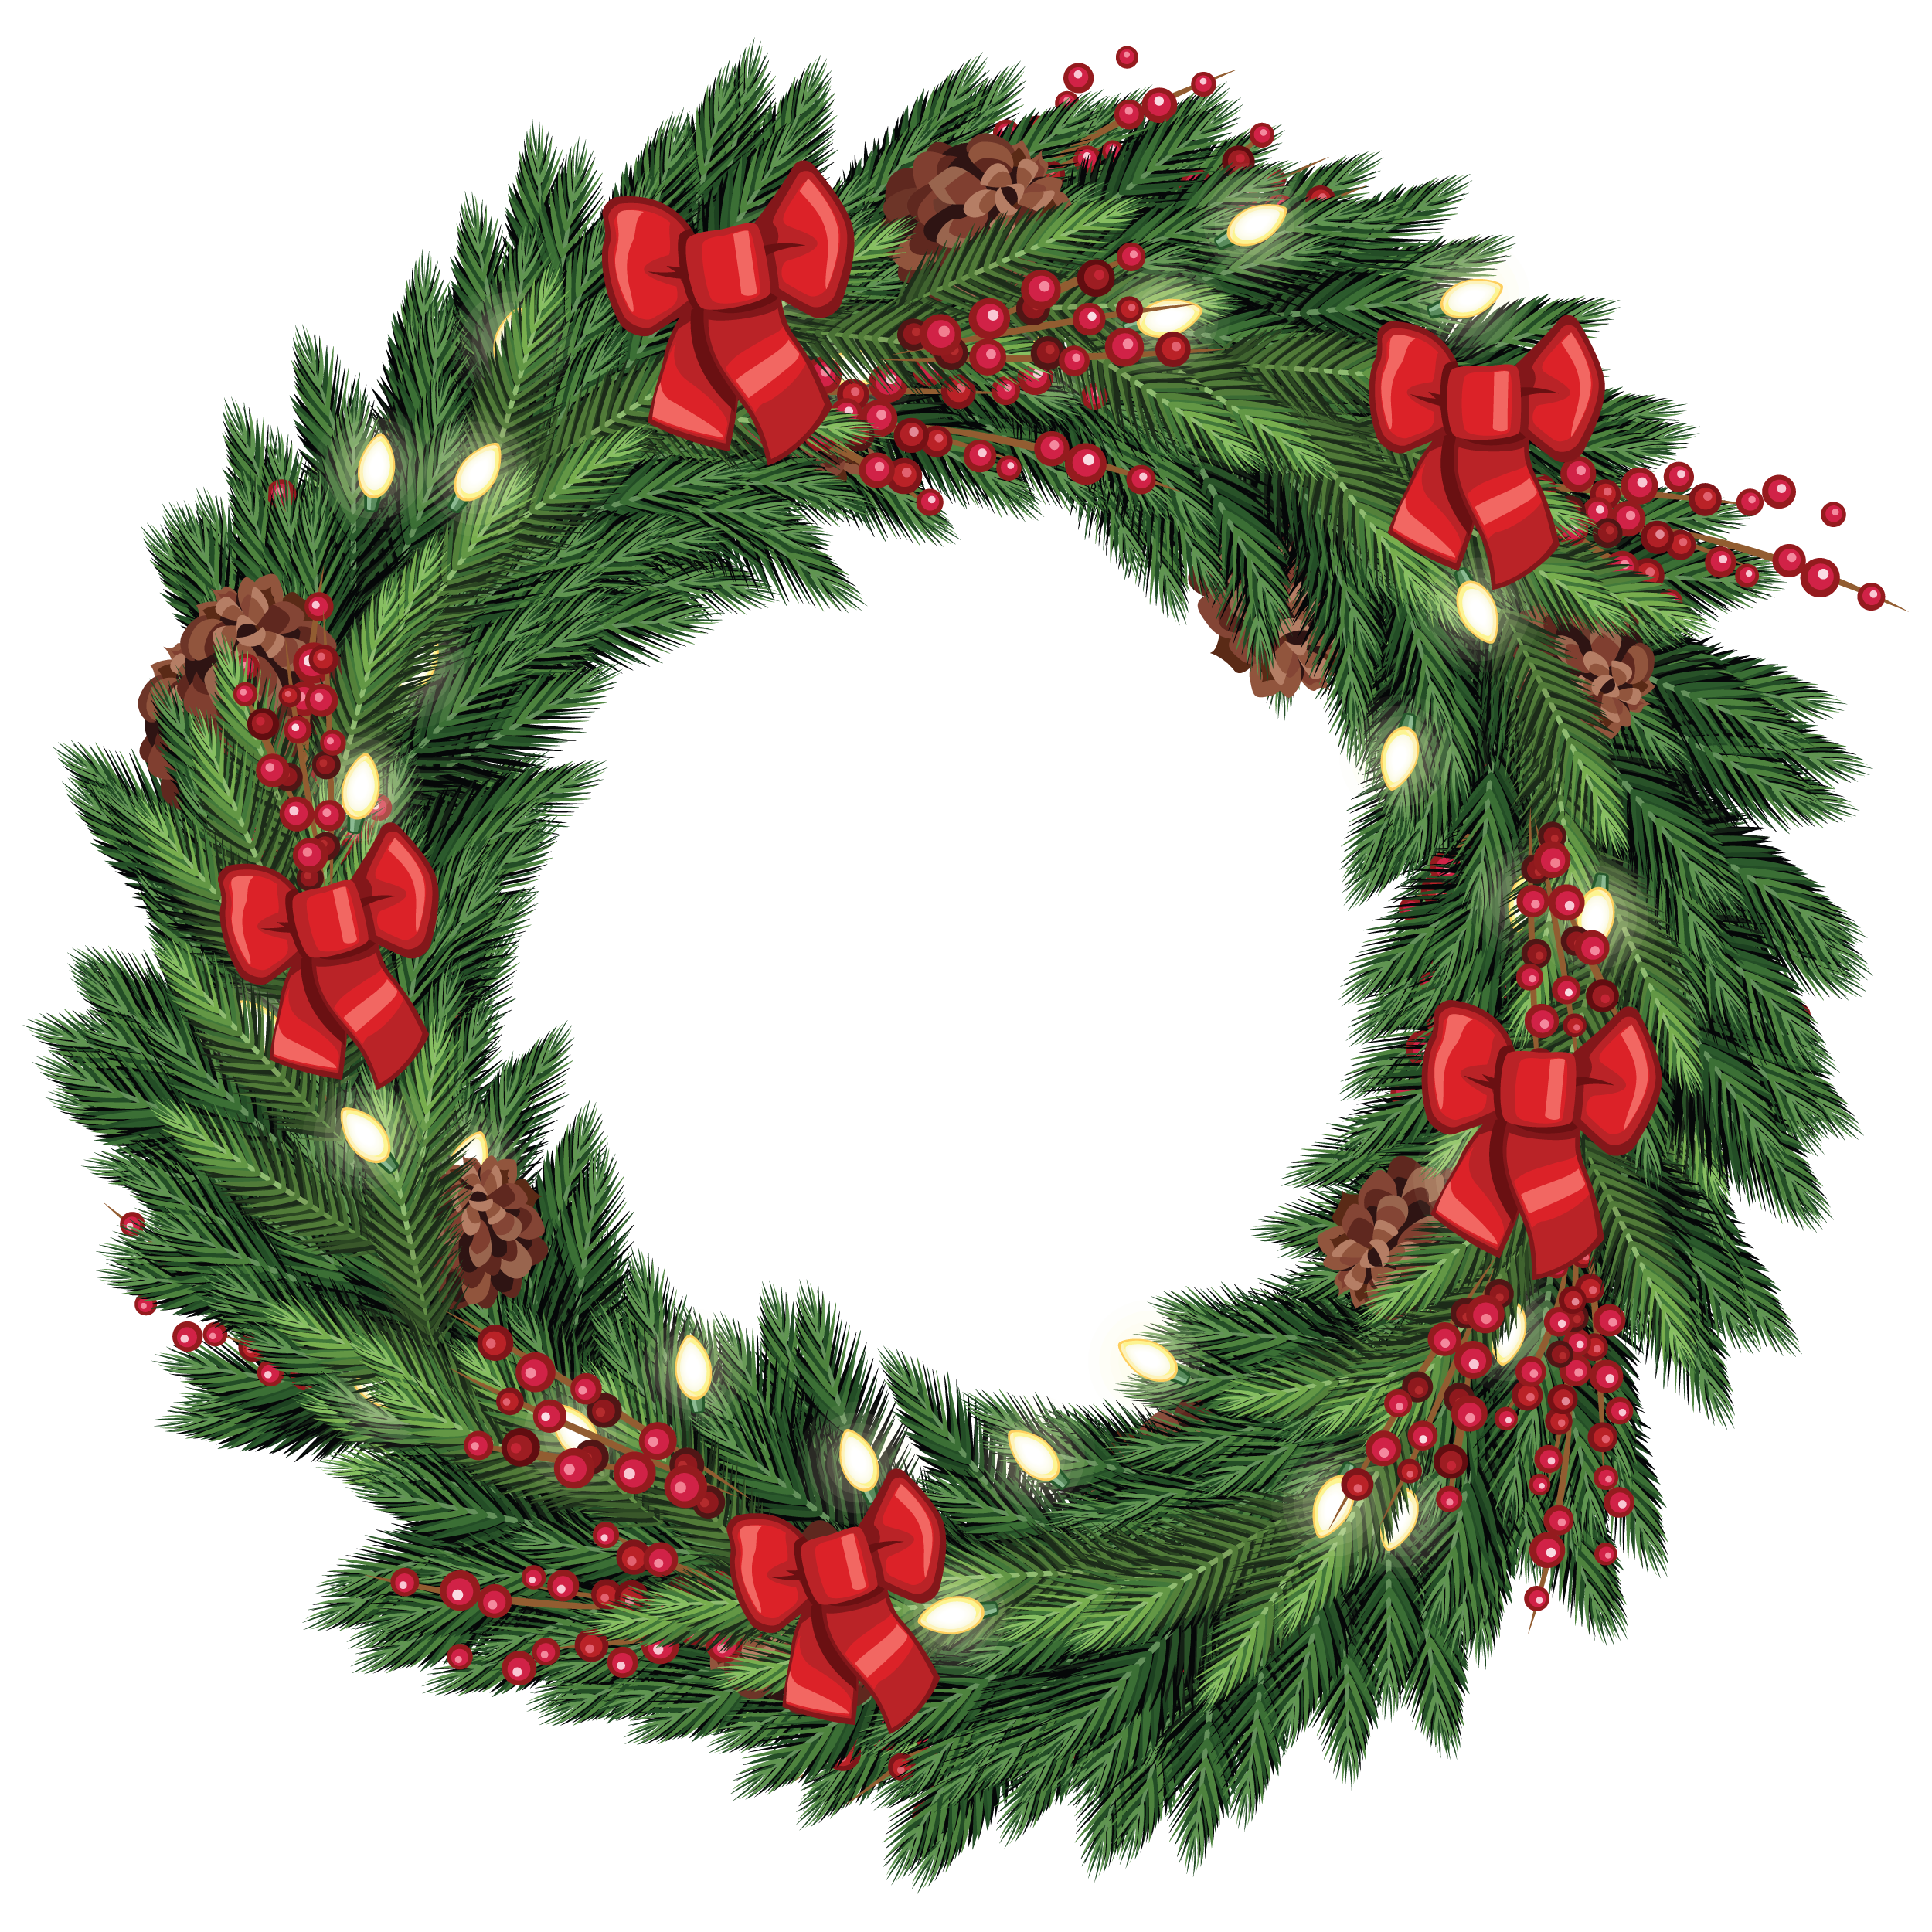 Art free christmas graphic. Fern clipart wreath